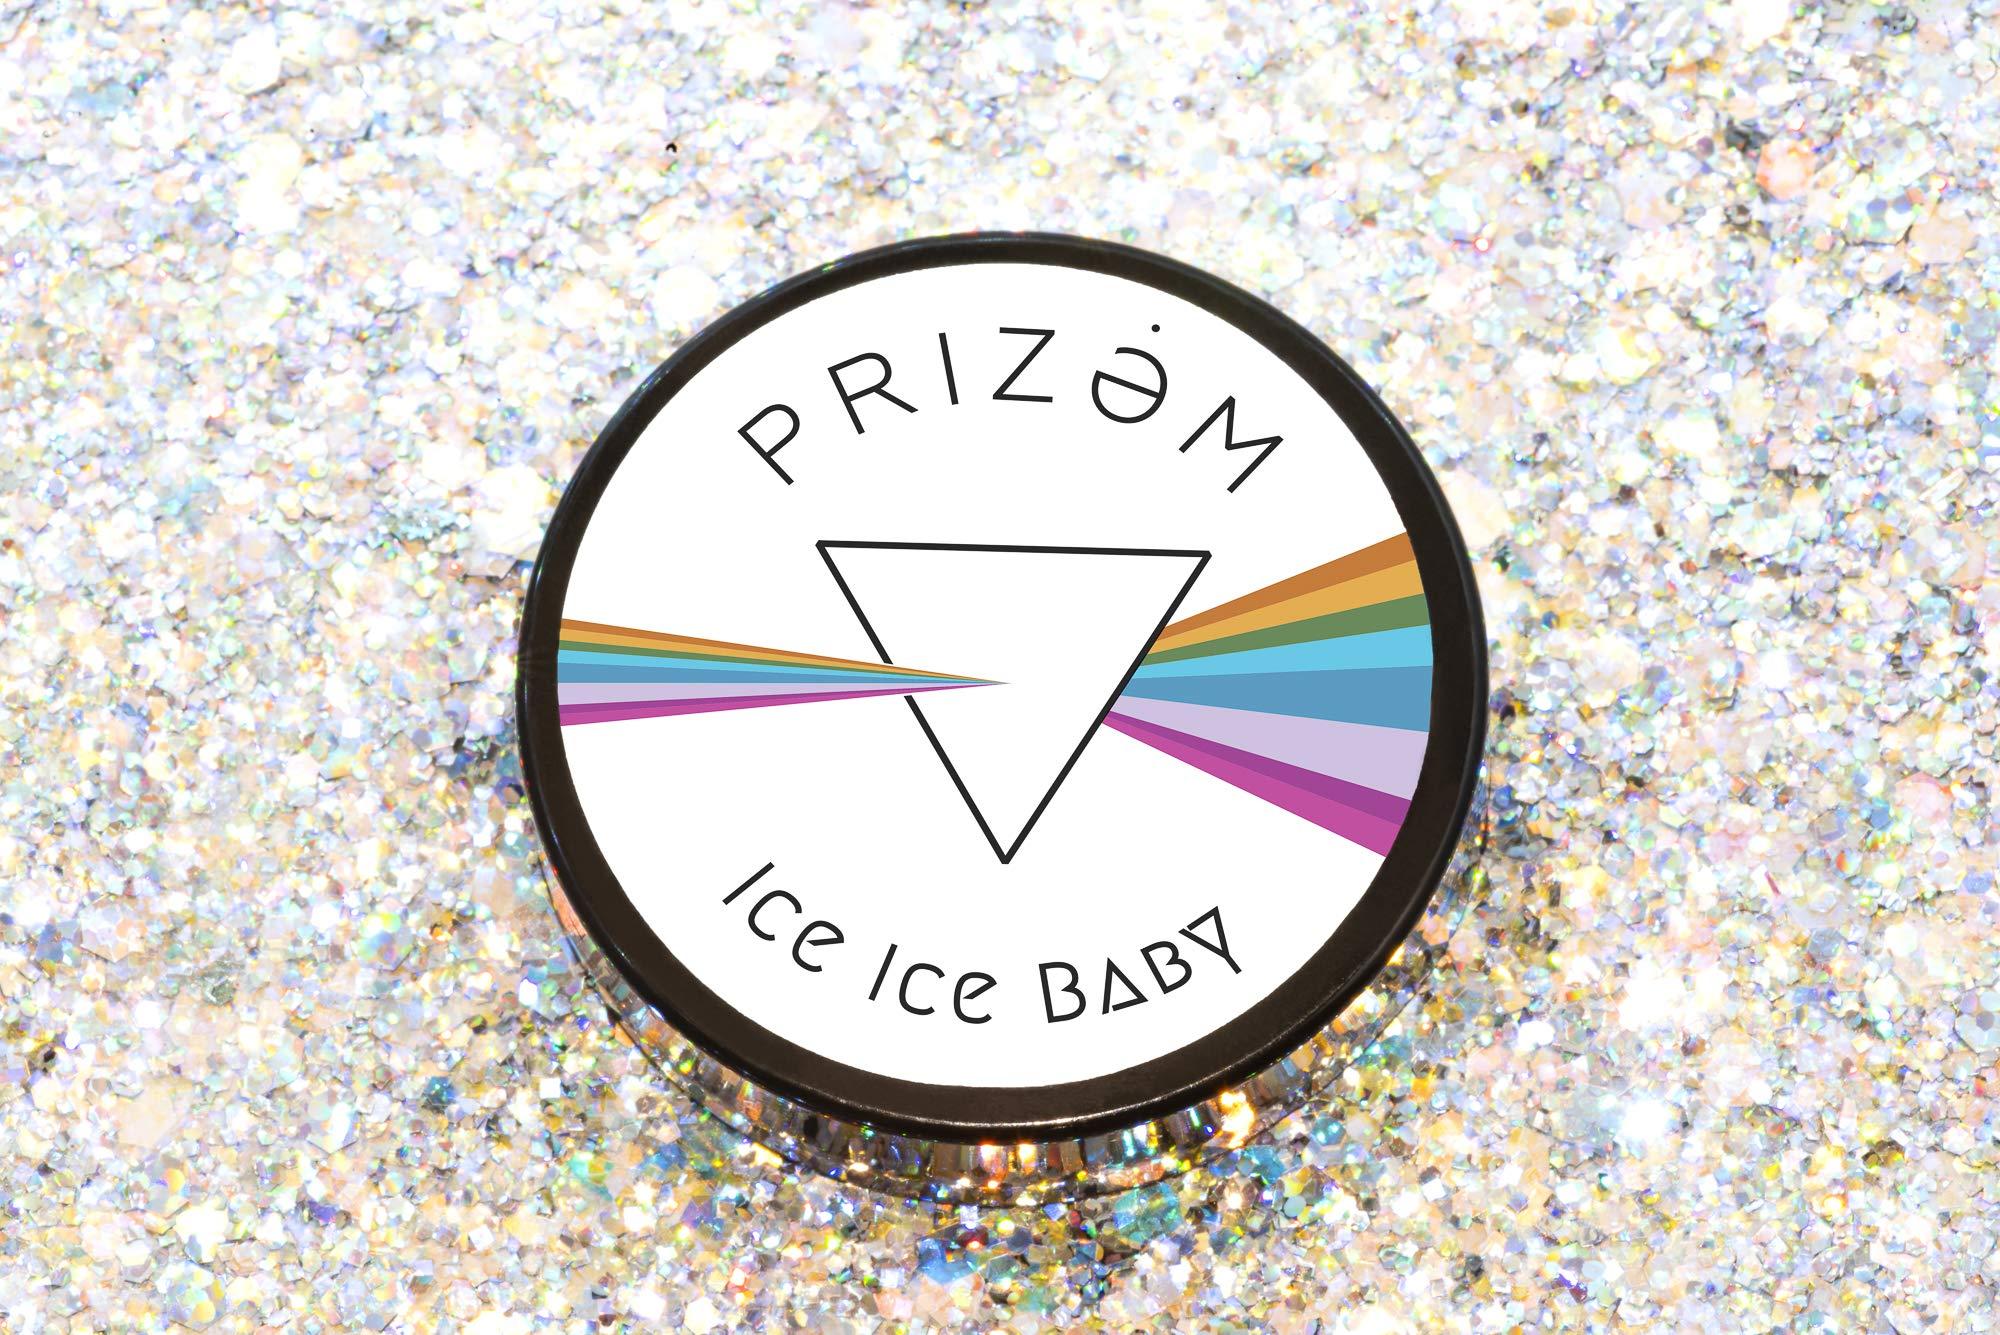 Prizem Ice Ice Baby Biodegradable Glitter ▽60g▽ Festival Glitter , Chunky Glitter , Makeup Glitter , Face Glitter , Body Glitter , Glitter Makeup , Hair Glitter , Cosmetic Glitter , Nail Glitter by Prizem